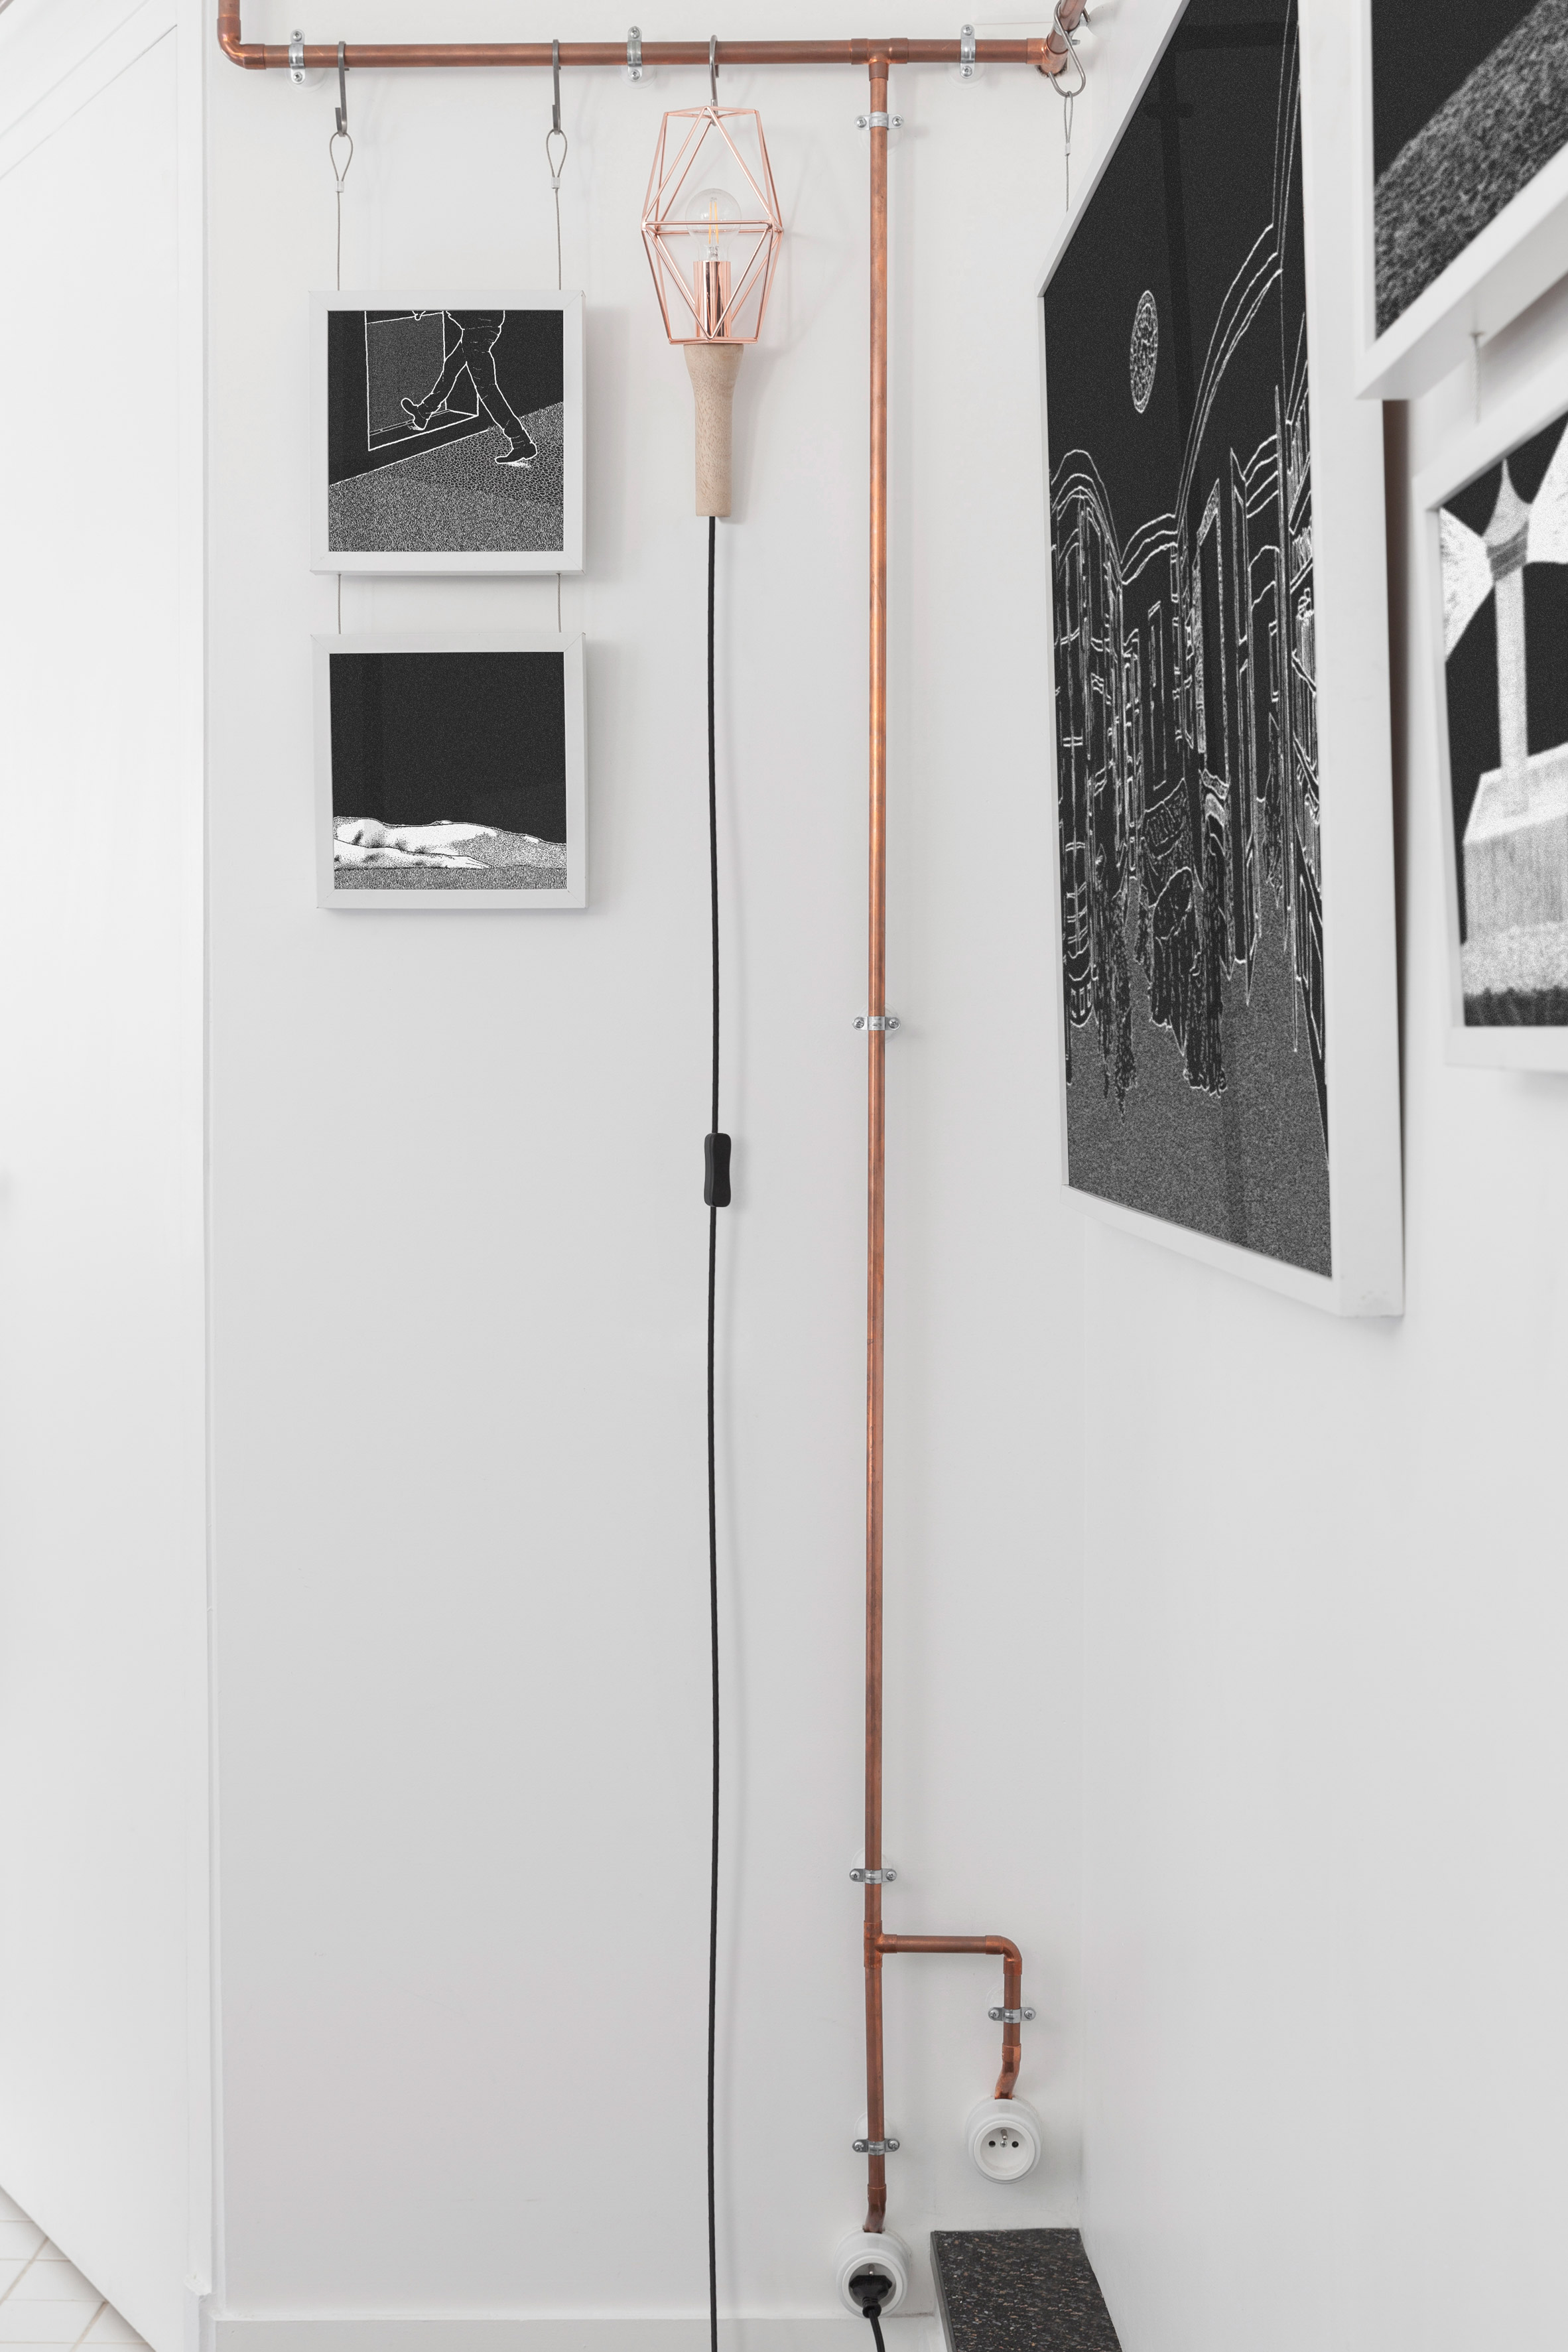 ARL008_Shaker Studio by Ariel Claudet